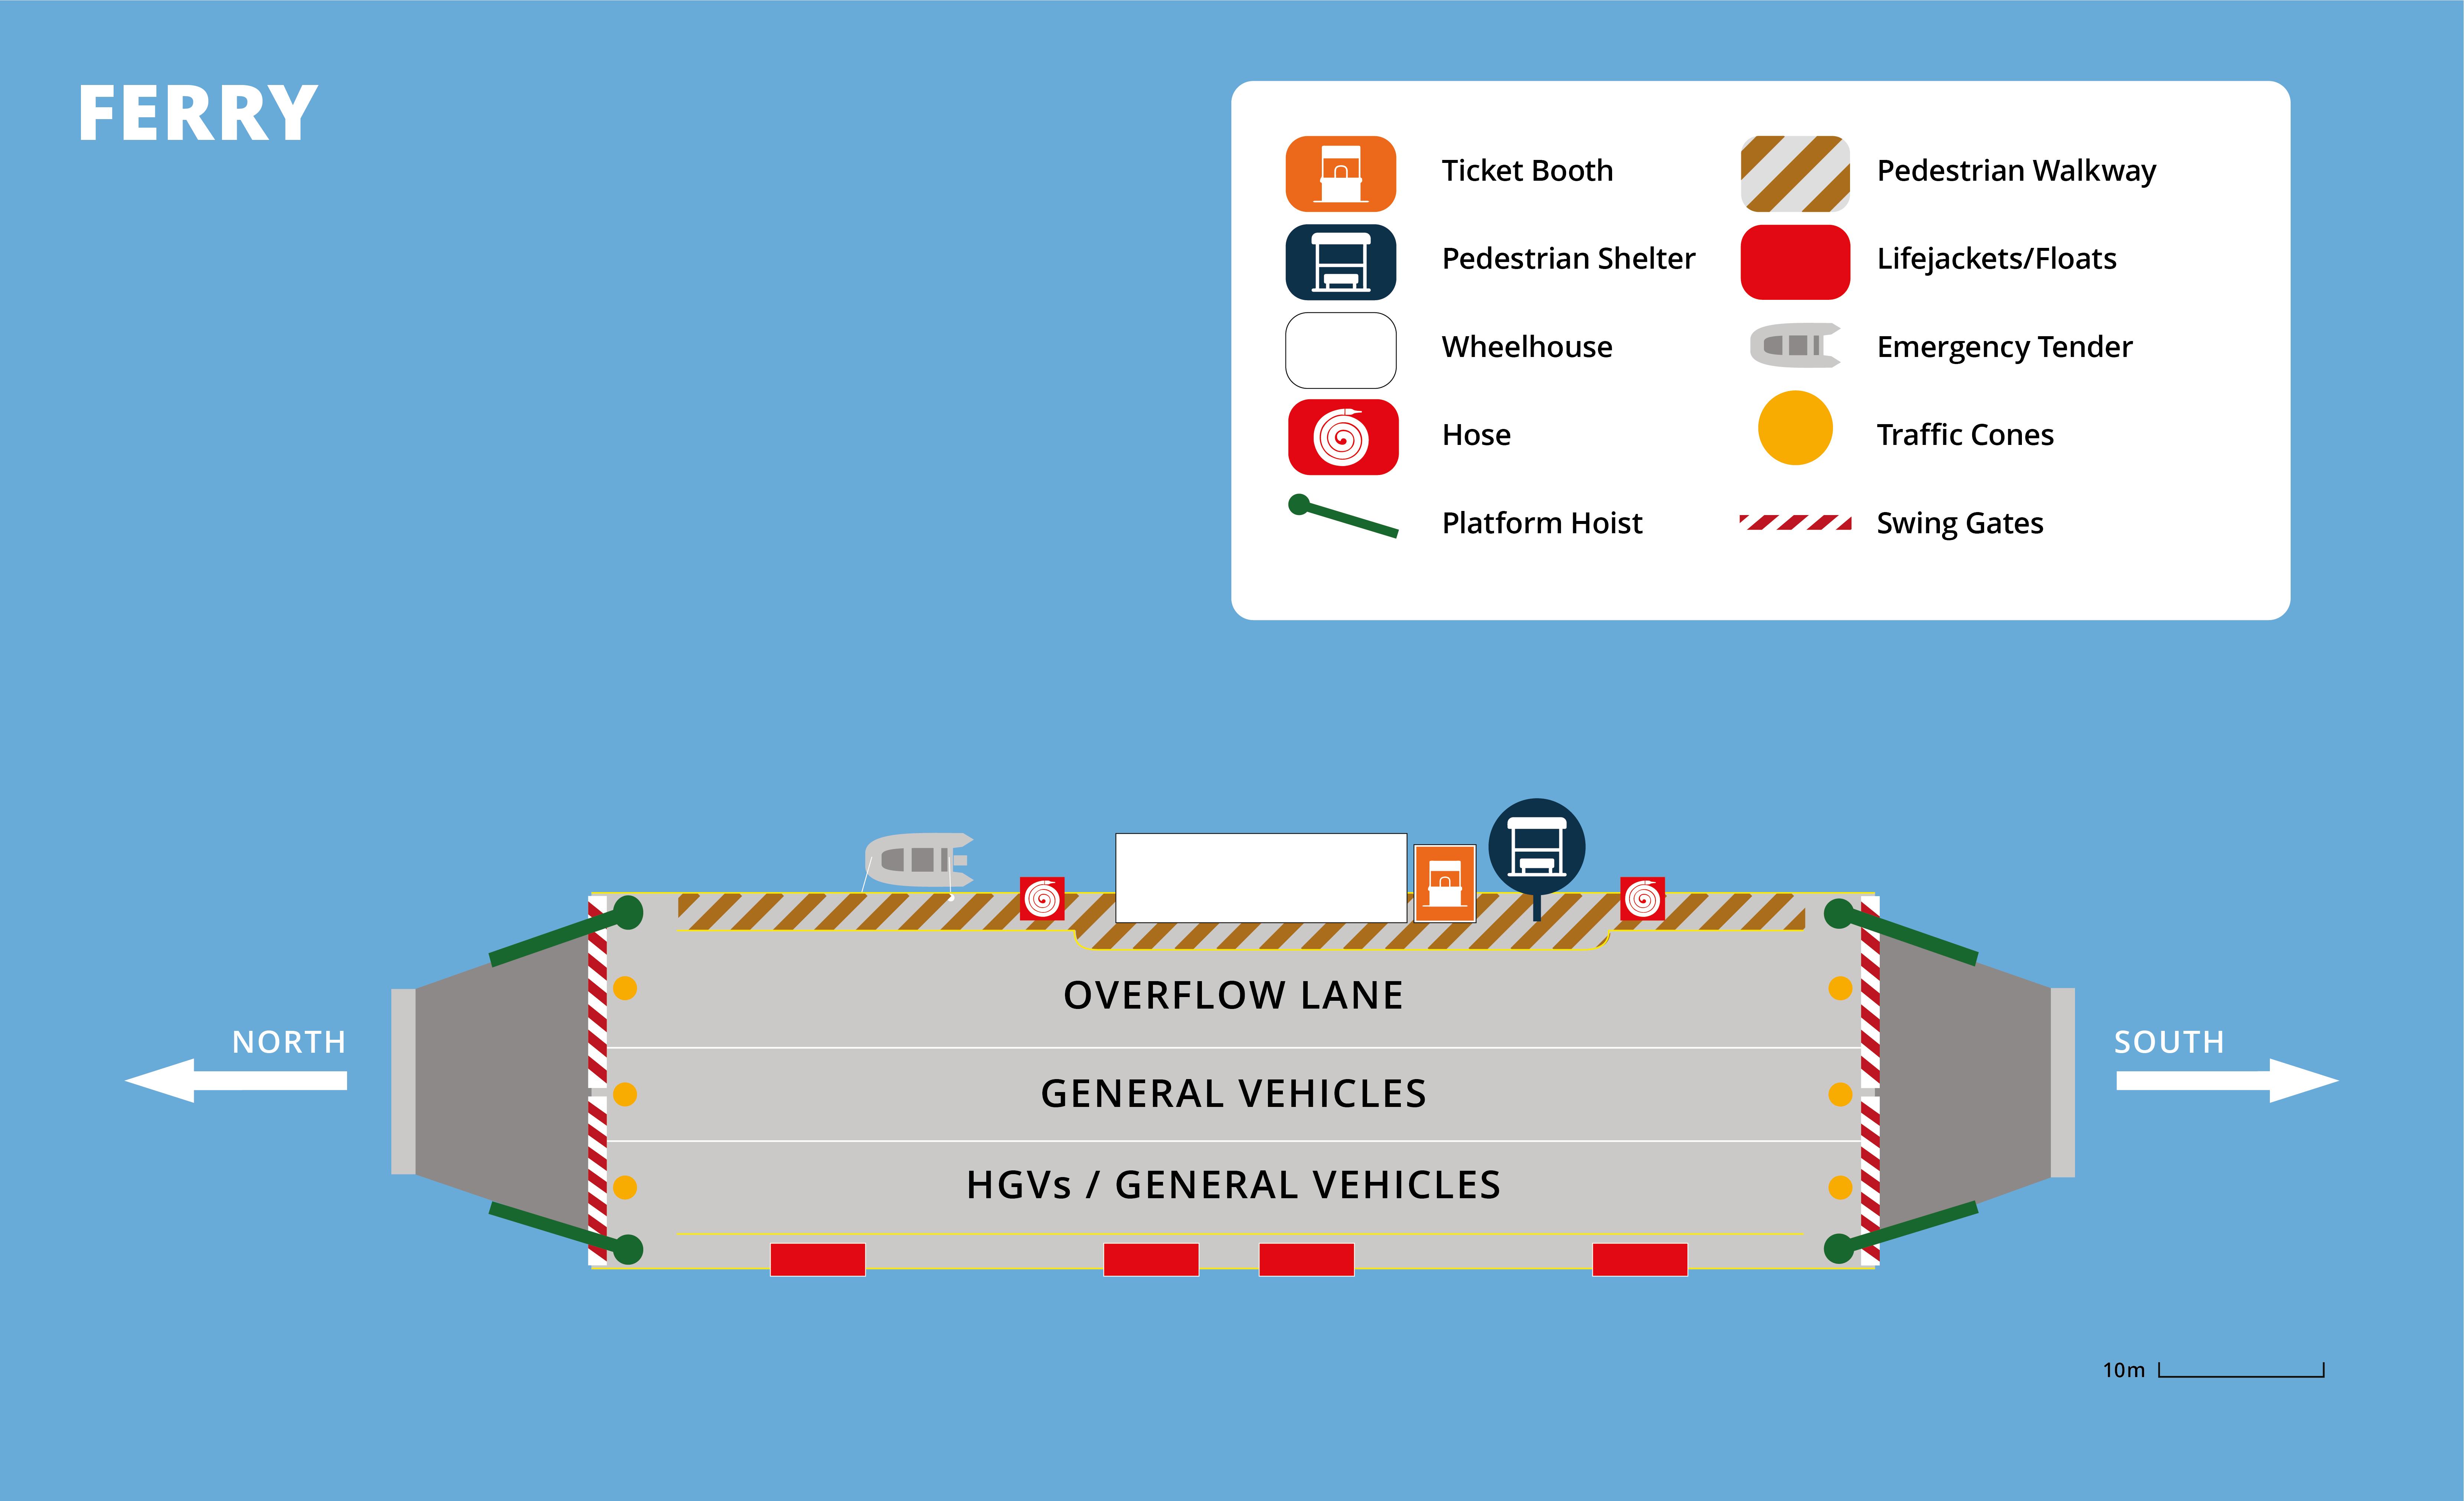 Daintree Ferry Diagram